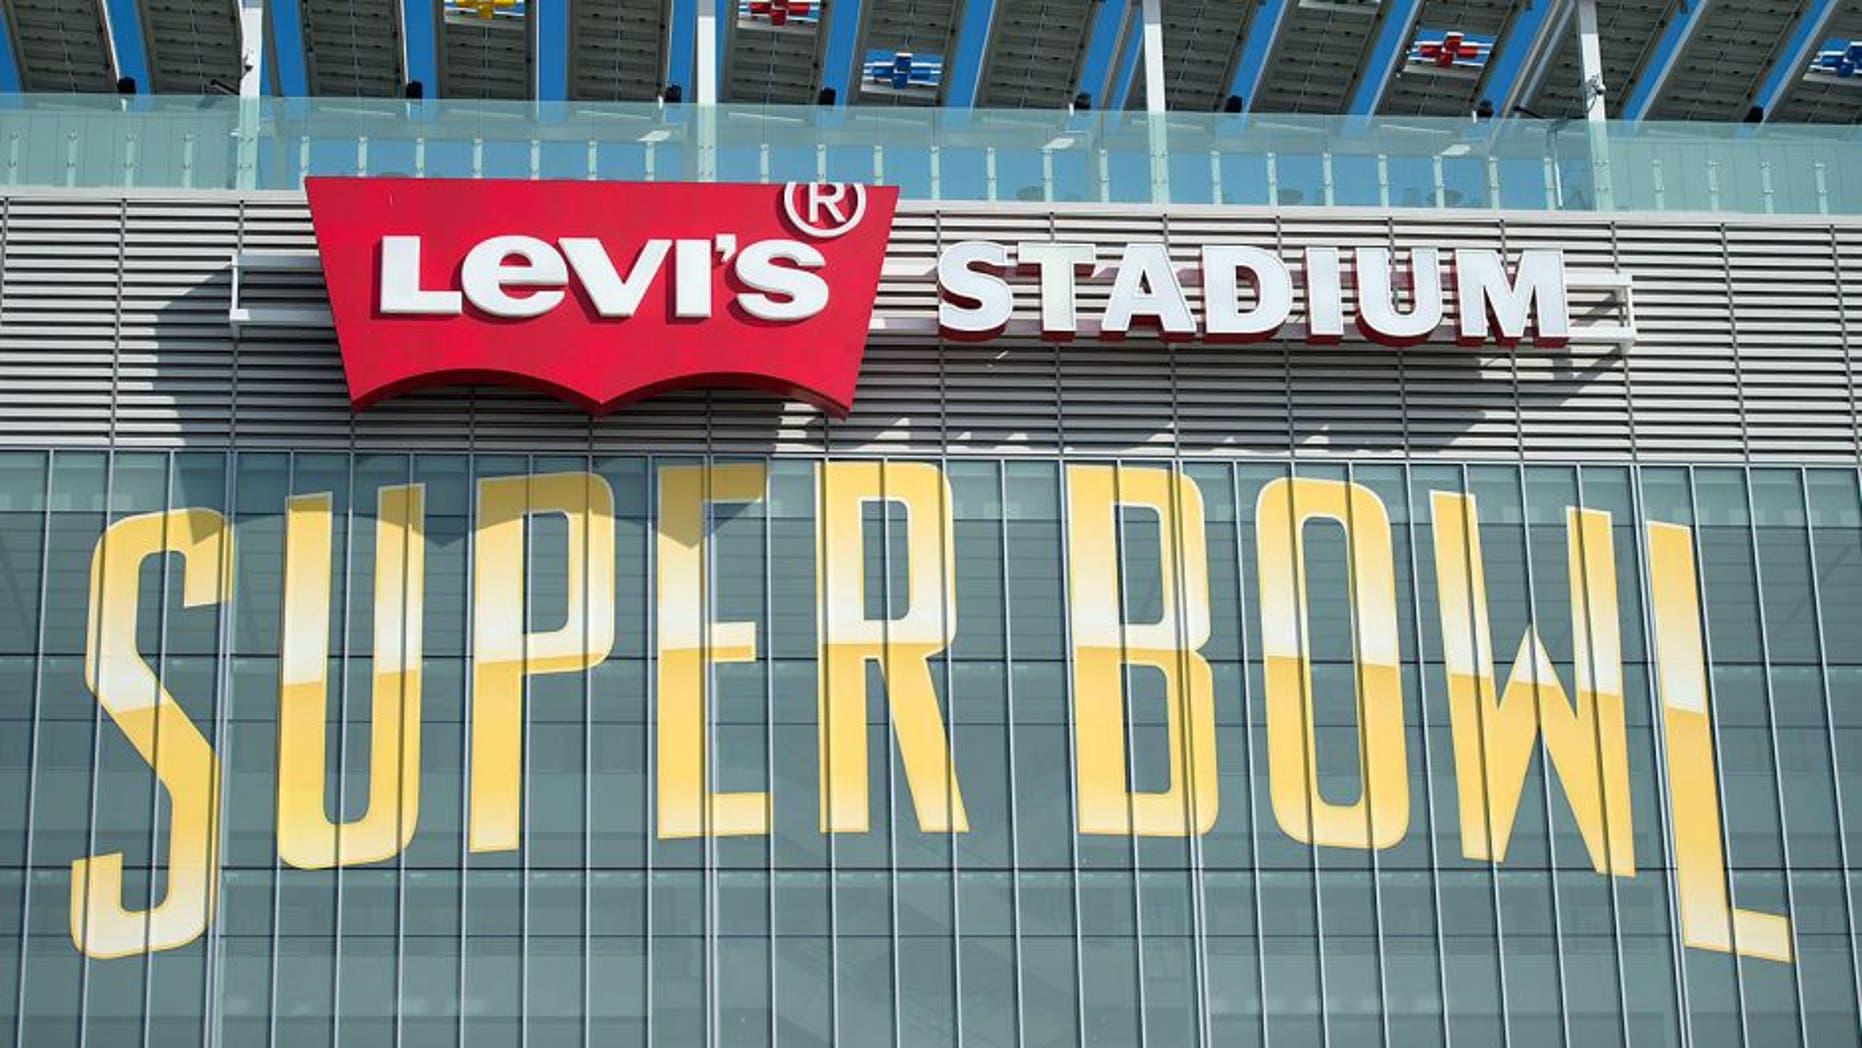 January 26, 2016; Santa Clara, CA, USA; General view of the exterior of Levi's Stadium prior to Super Bowl 50. Mandatory Credit: Kyle Terada-USA TODAY Sports